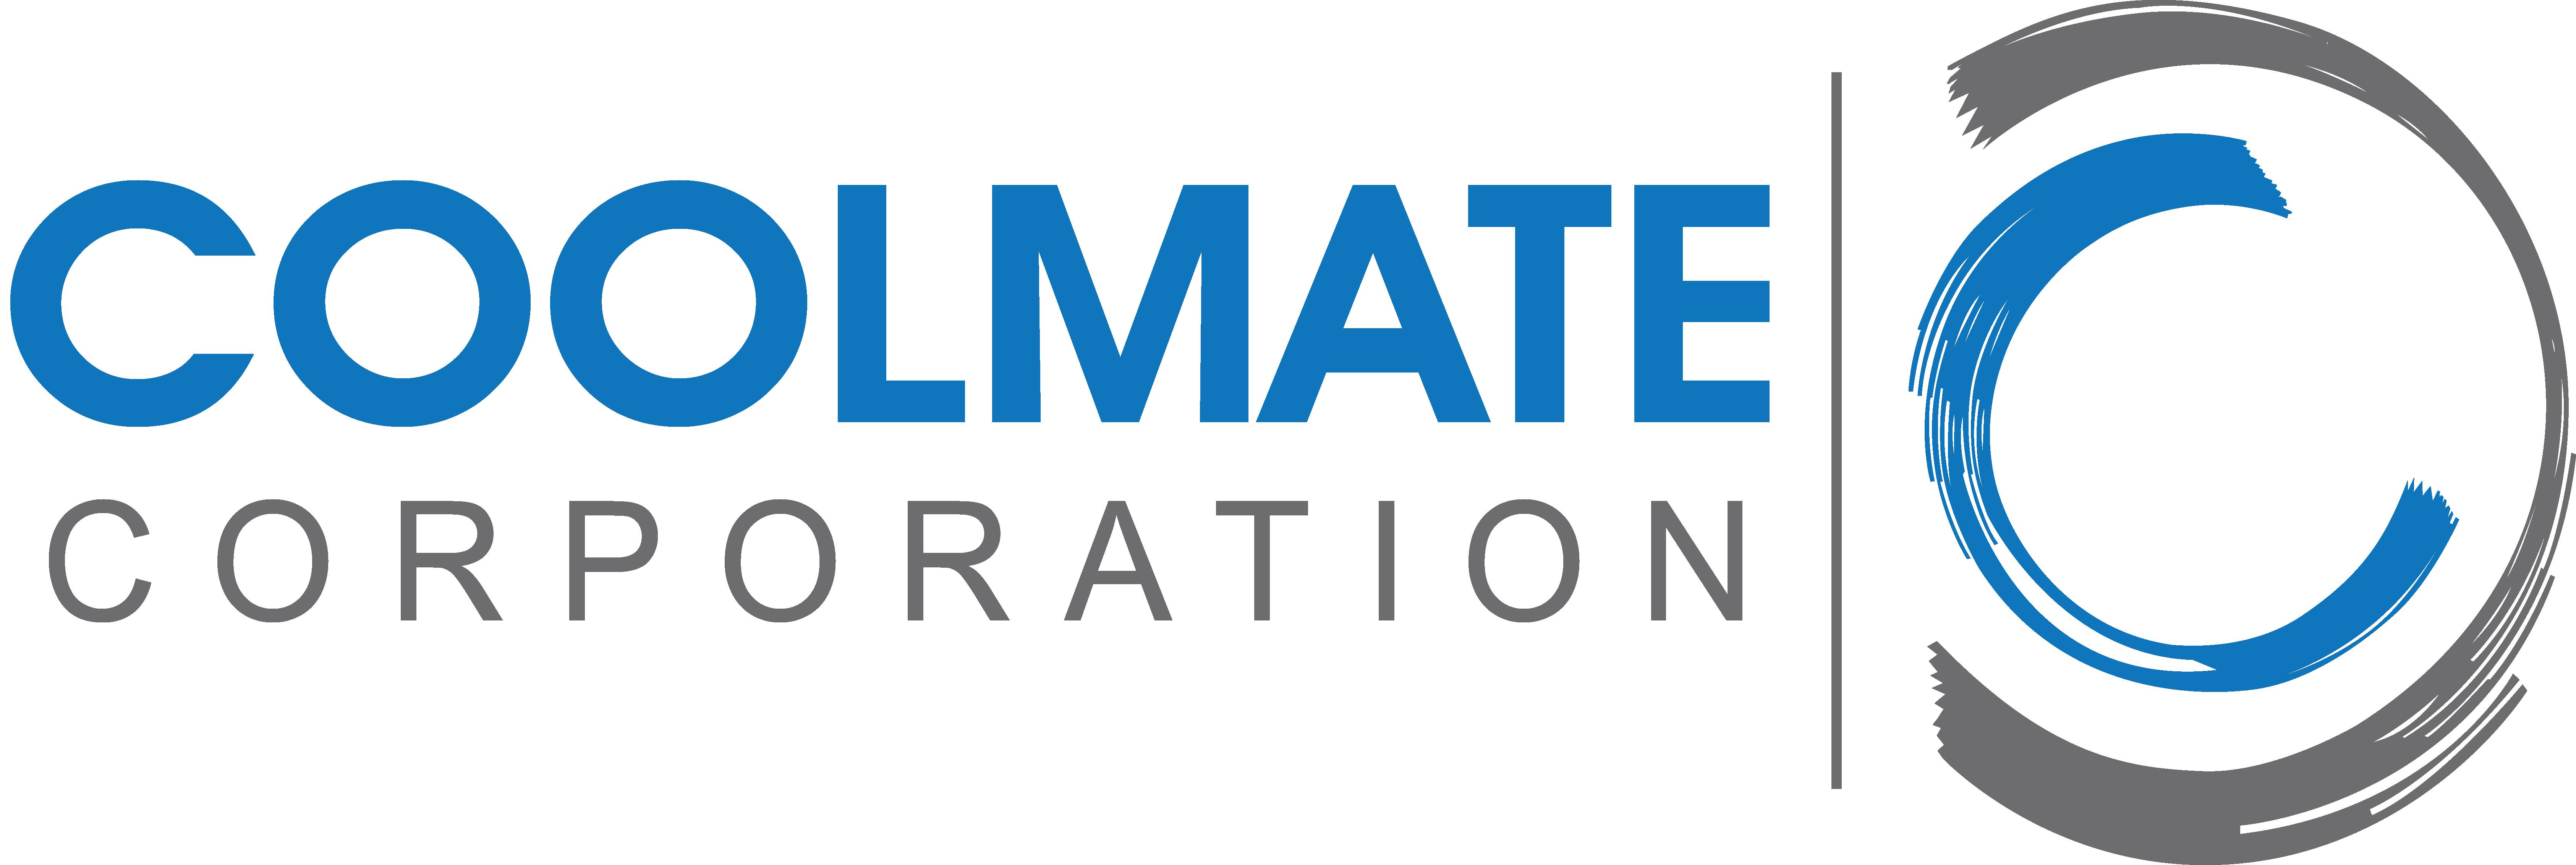 coolmate_logo (1)